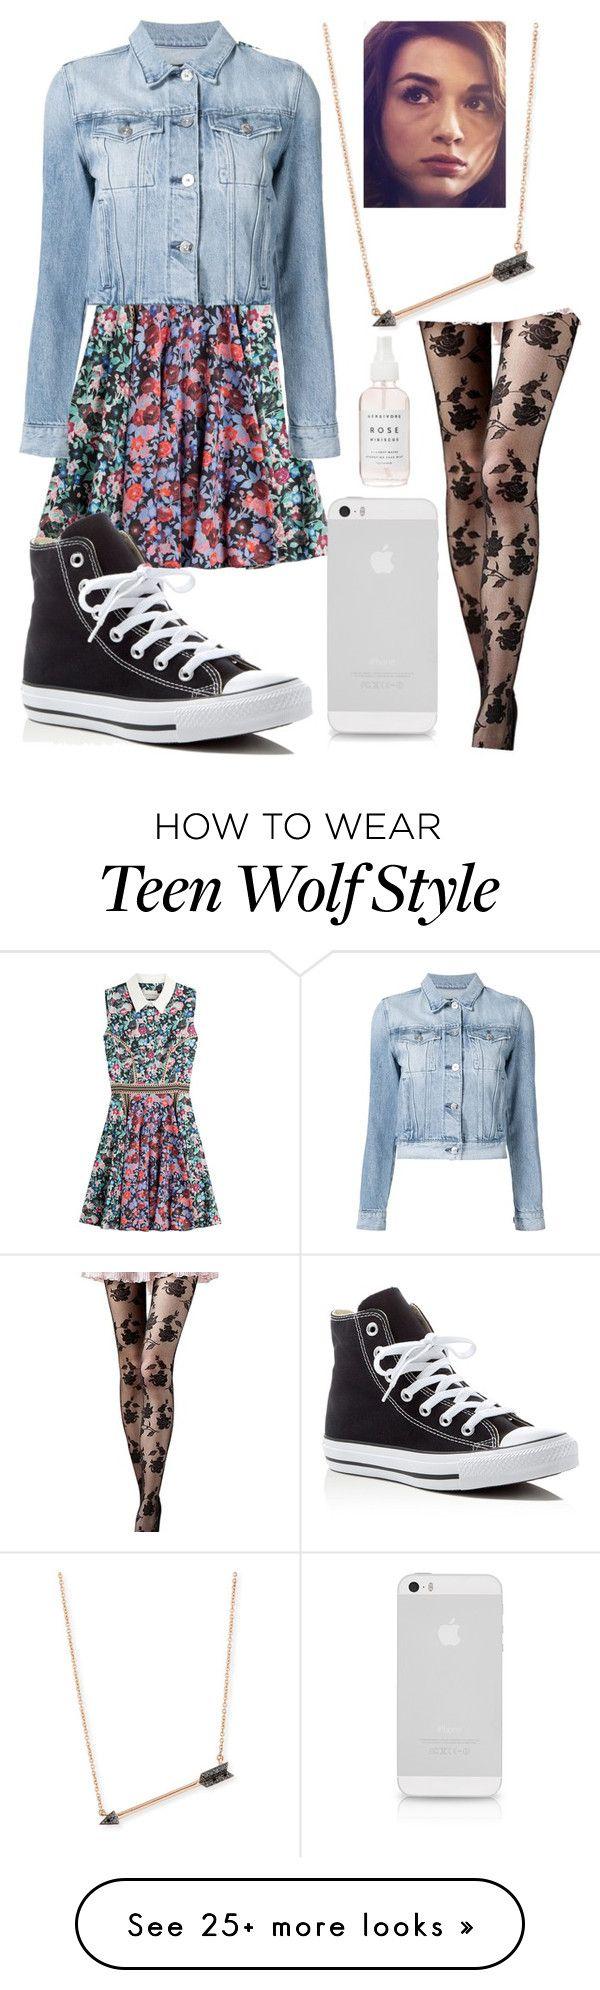 """Teen Wolf: Allison Argent"" by jordan-mettam on Polyvore featuring Mary Katrantzou, 3x1, Converse and Sydney Evan"